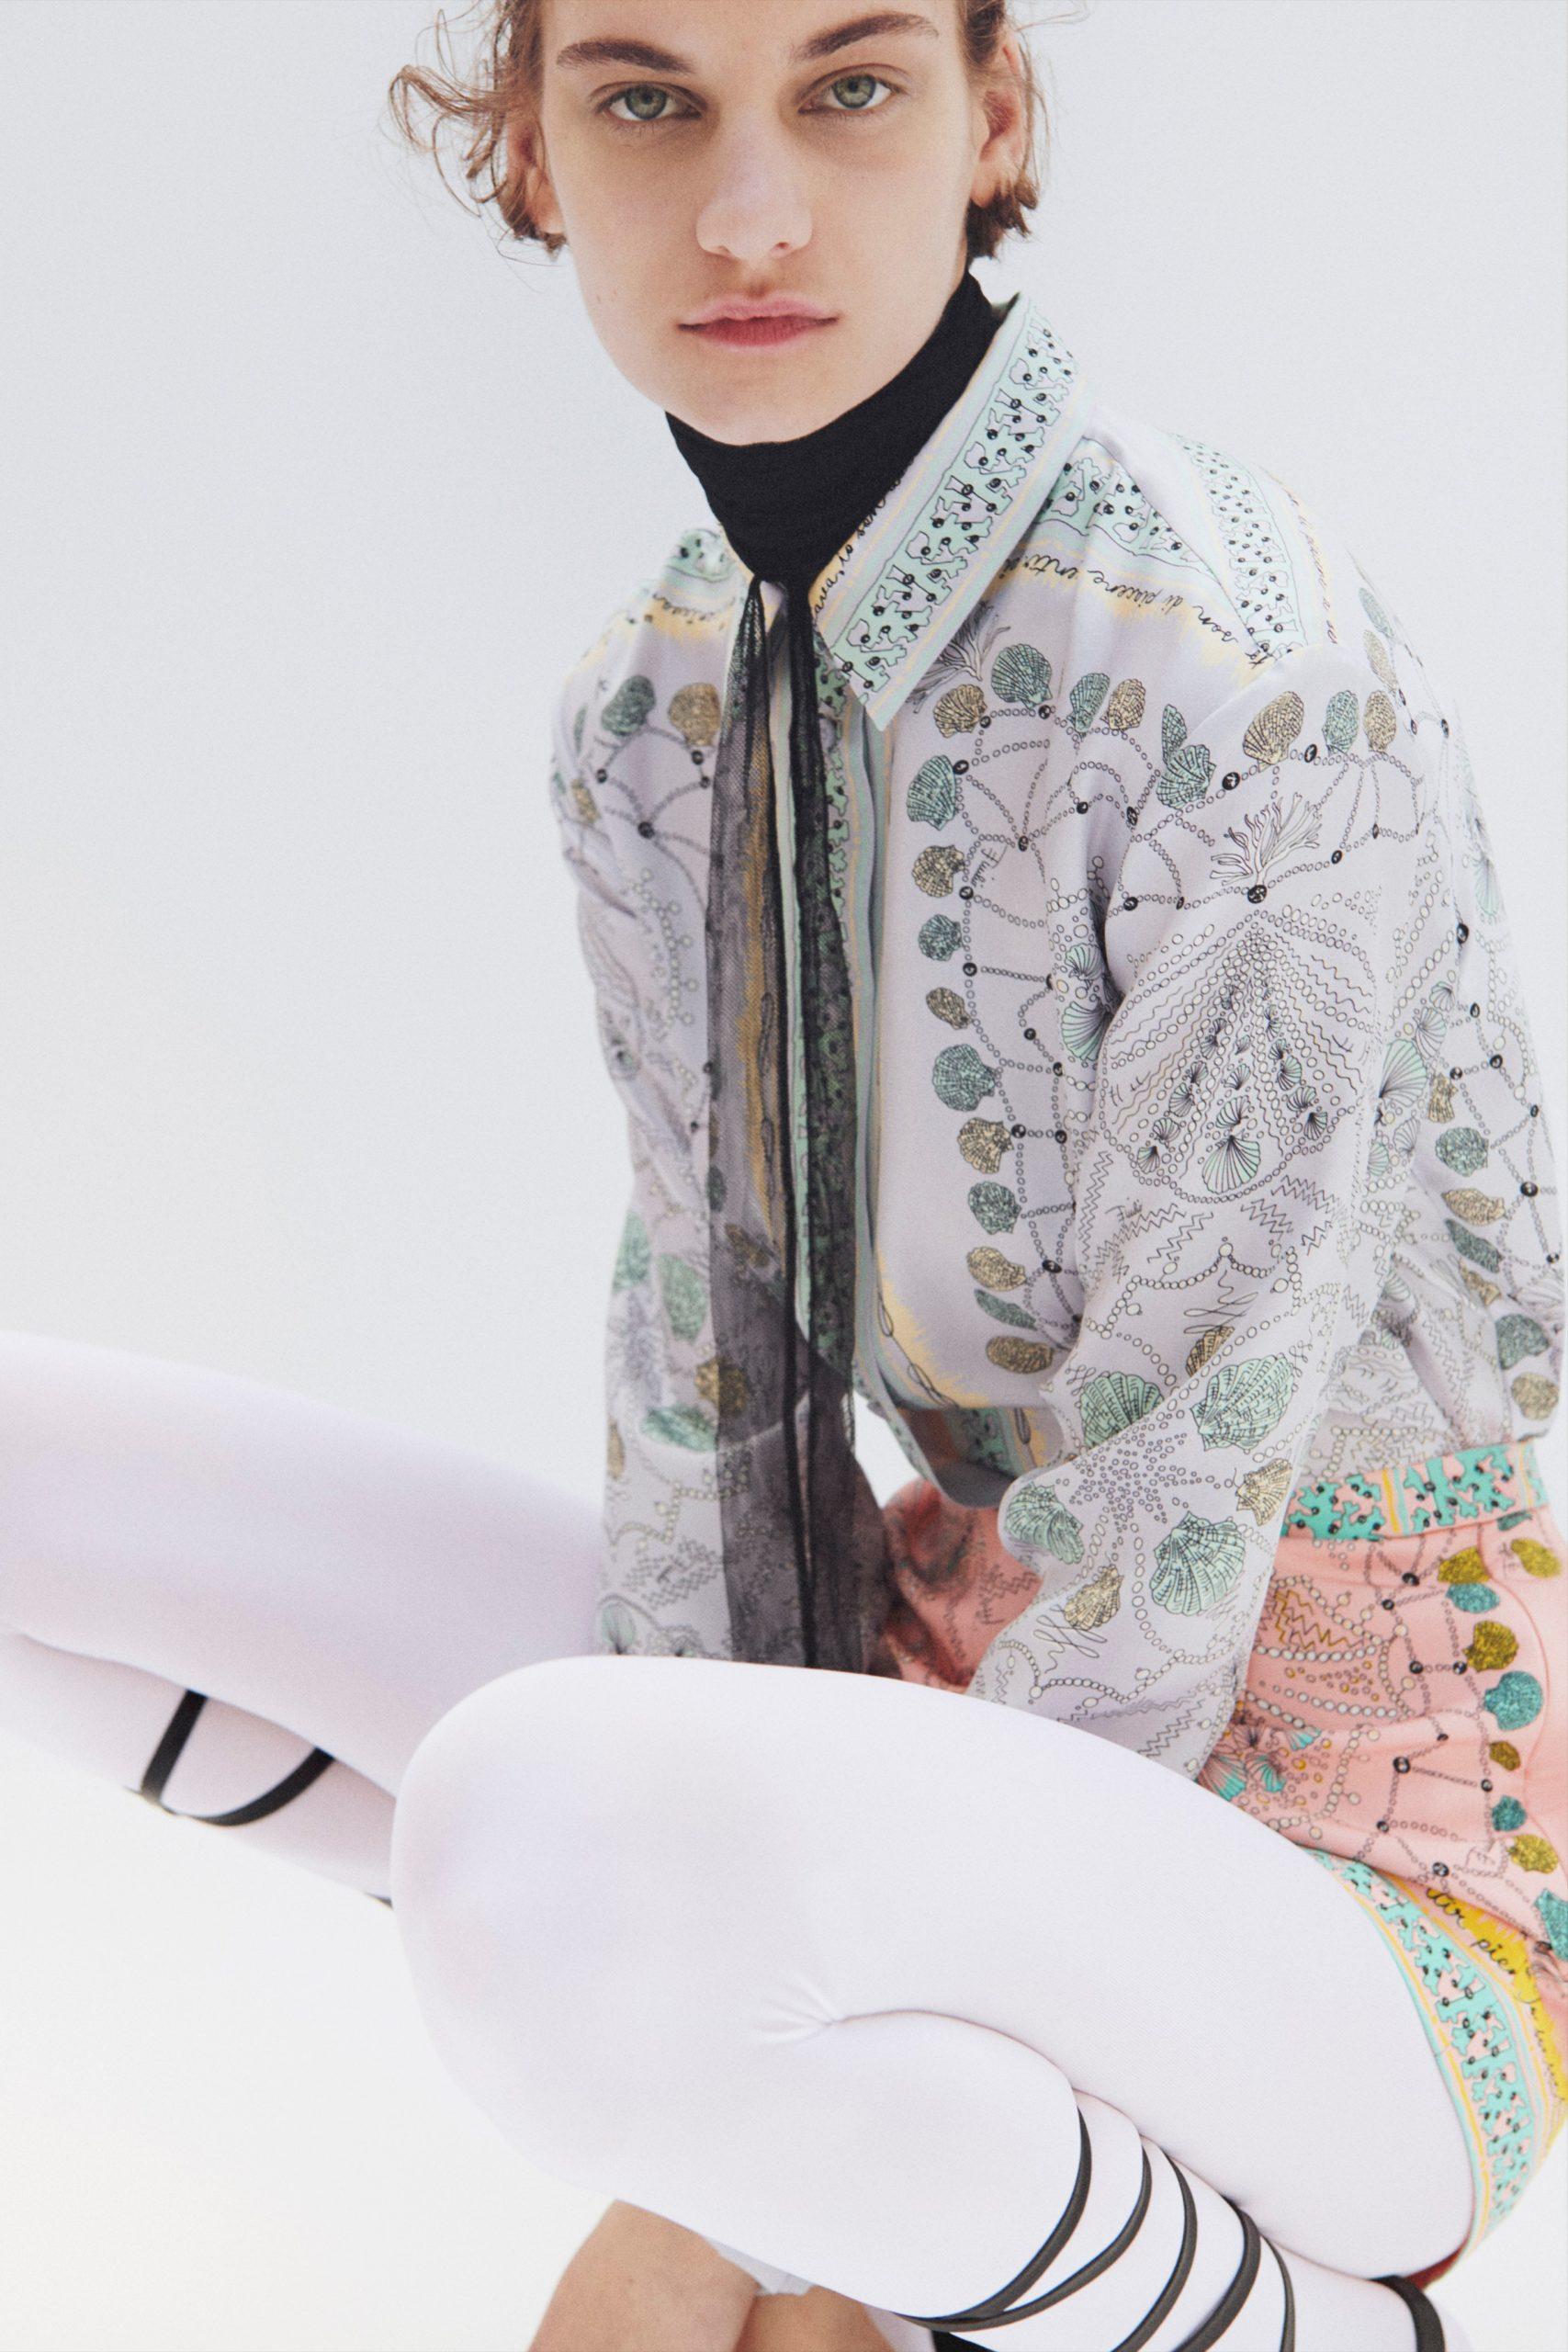 Emilio Pucci Spring Summer 2021 – Capsule Tomo Koizumi by RUNWAY MAGAZINE